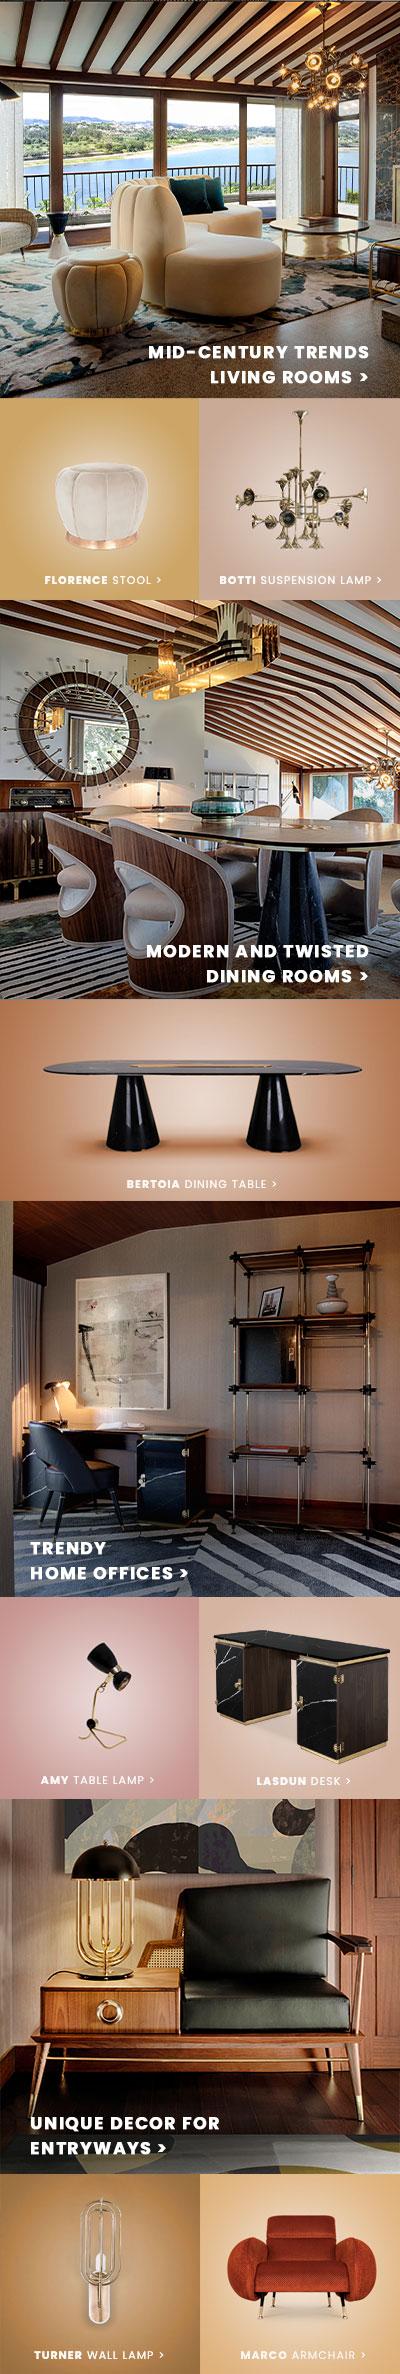 Living Room Ideas sidebannermoodboardEHourhouses 1